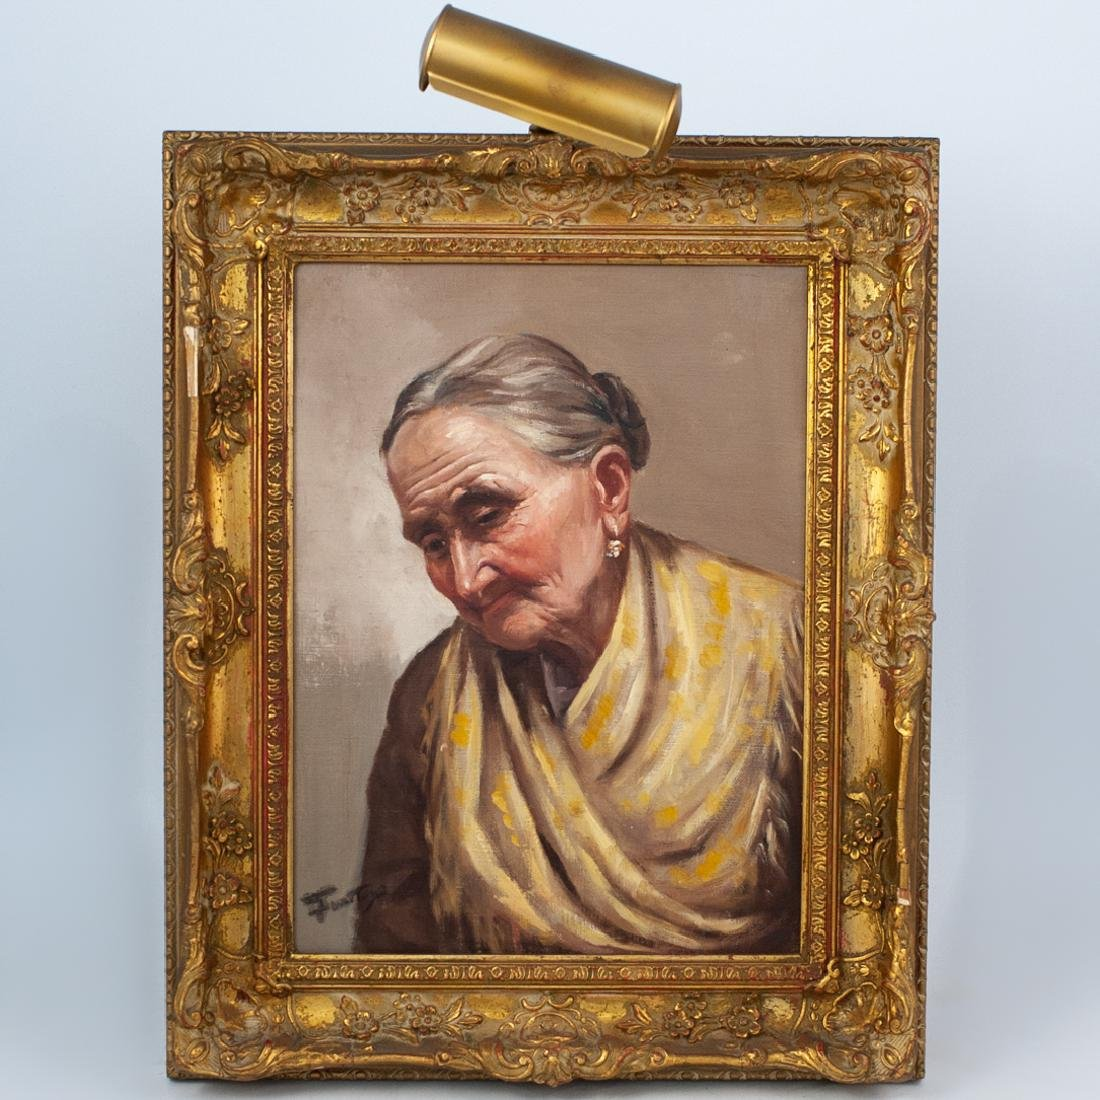 Enrico Frattini (Italian, 1890-1968) Portrait of a